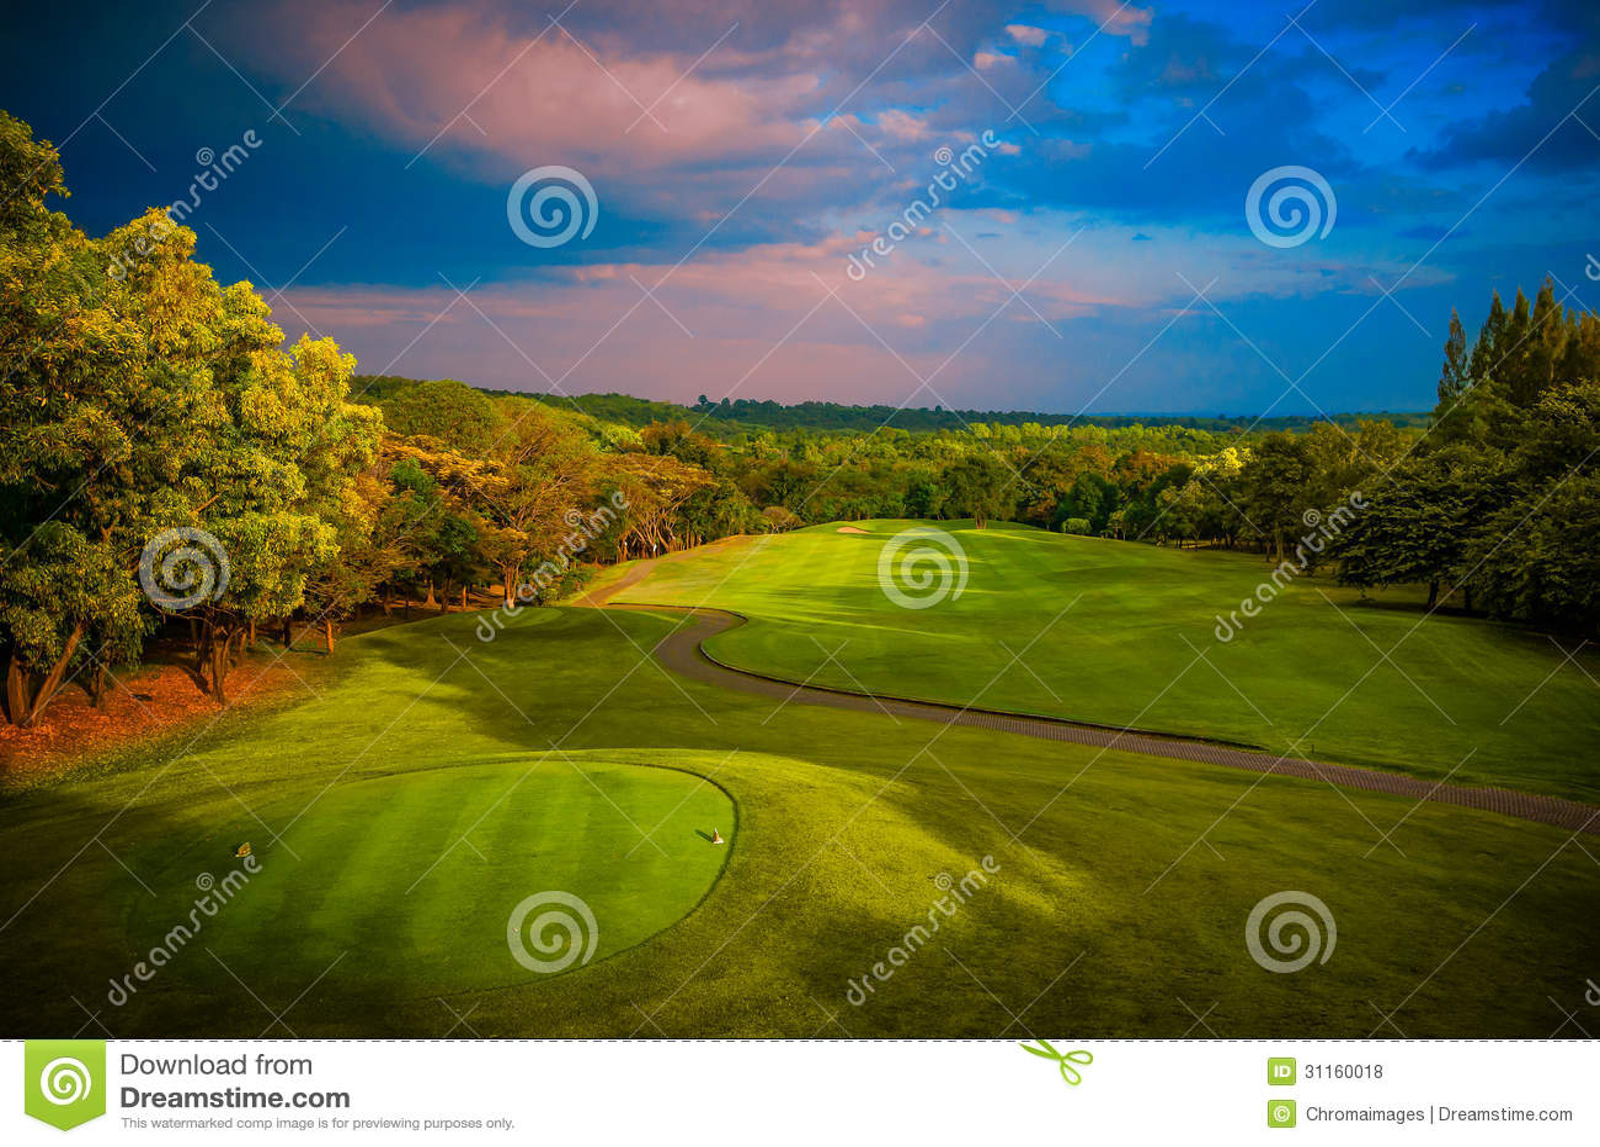 Panorama Golf and CC.